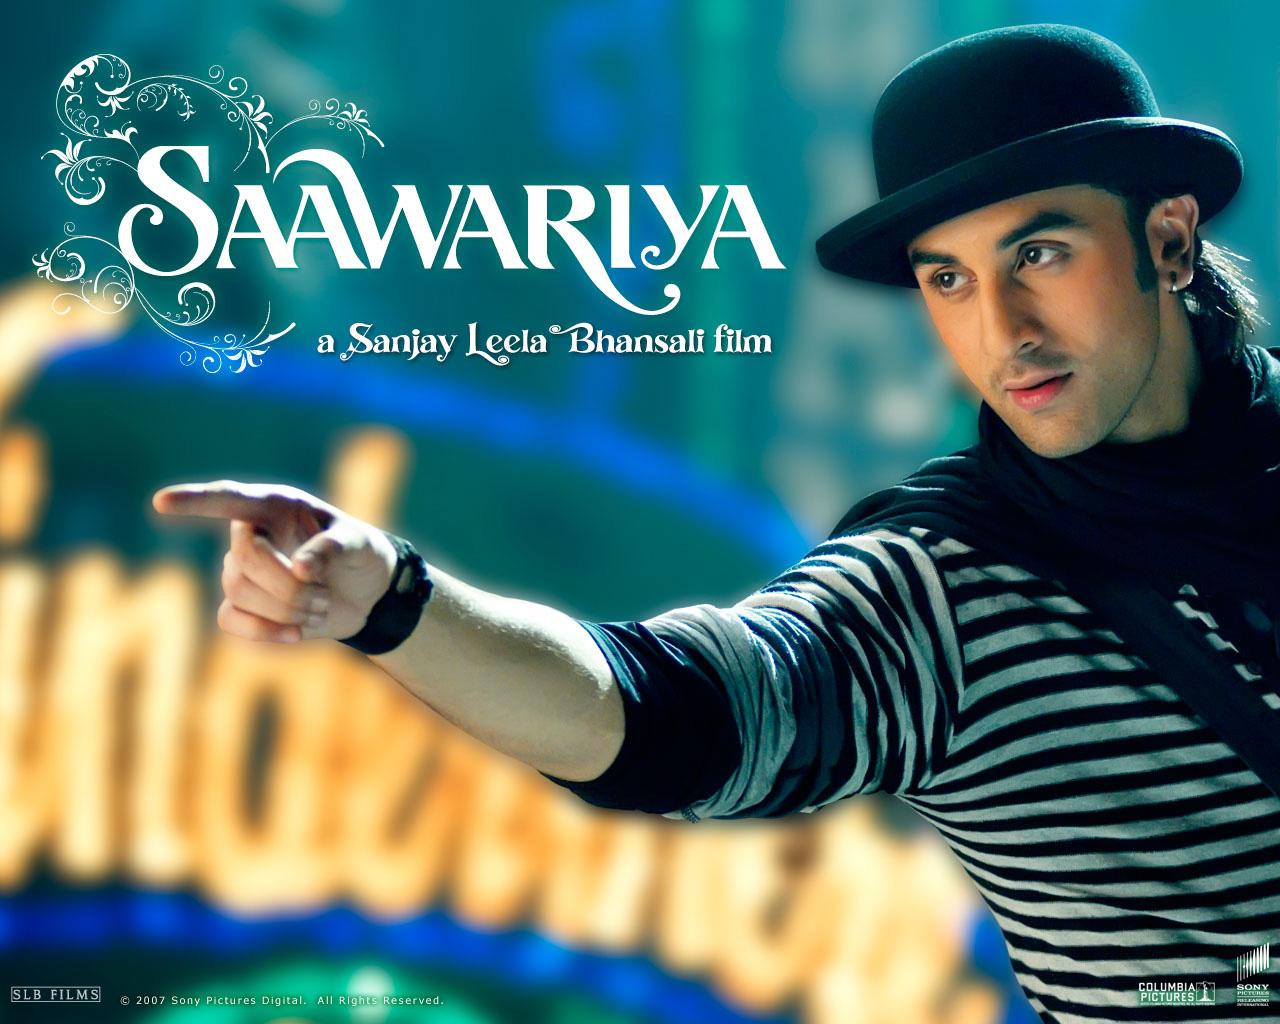 http://3.bp.blogspot.com/-_EG-z1oUVxI/TYMC5Rvc5uI/AAAAAAAAAig/1djCPiKM-AQ/s1600/Ranbir_Kapoor_in_Saawariya_Wallpaper_2_1280.jpg